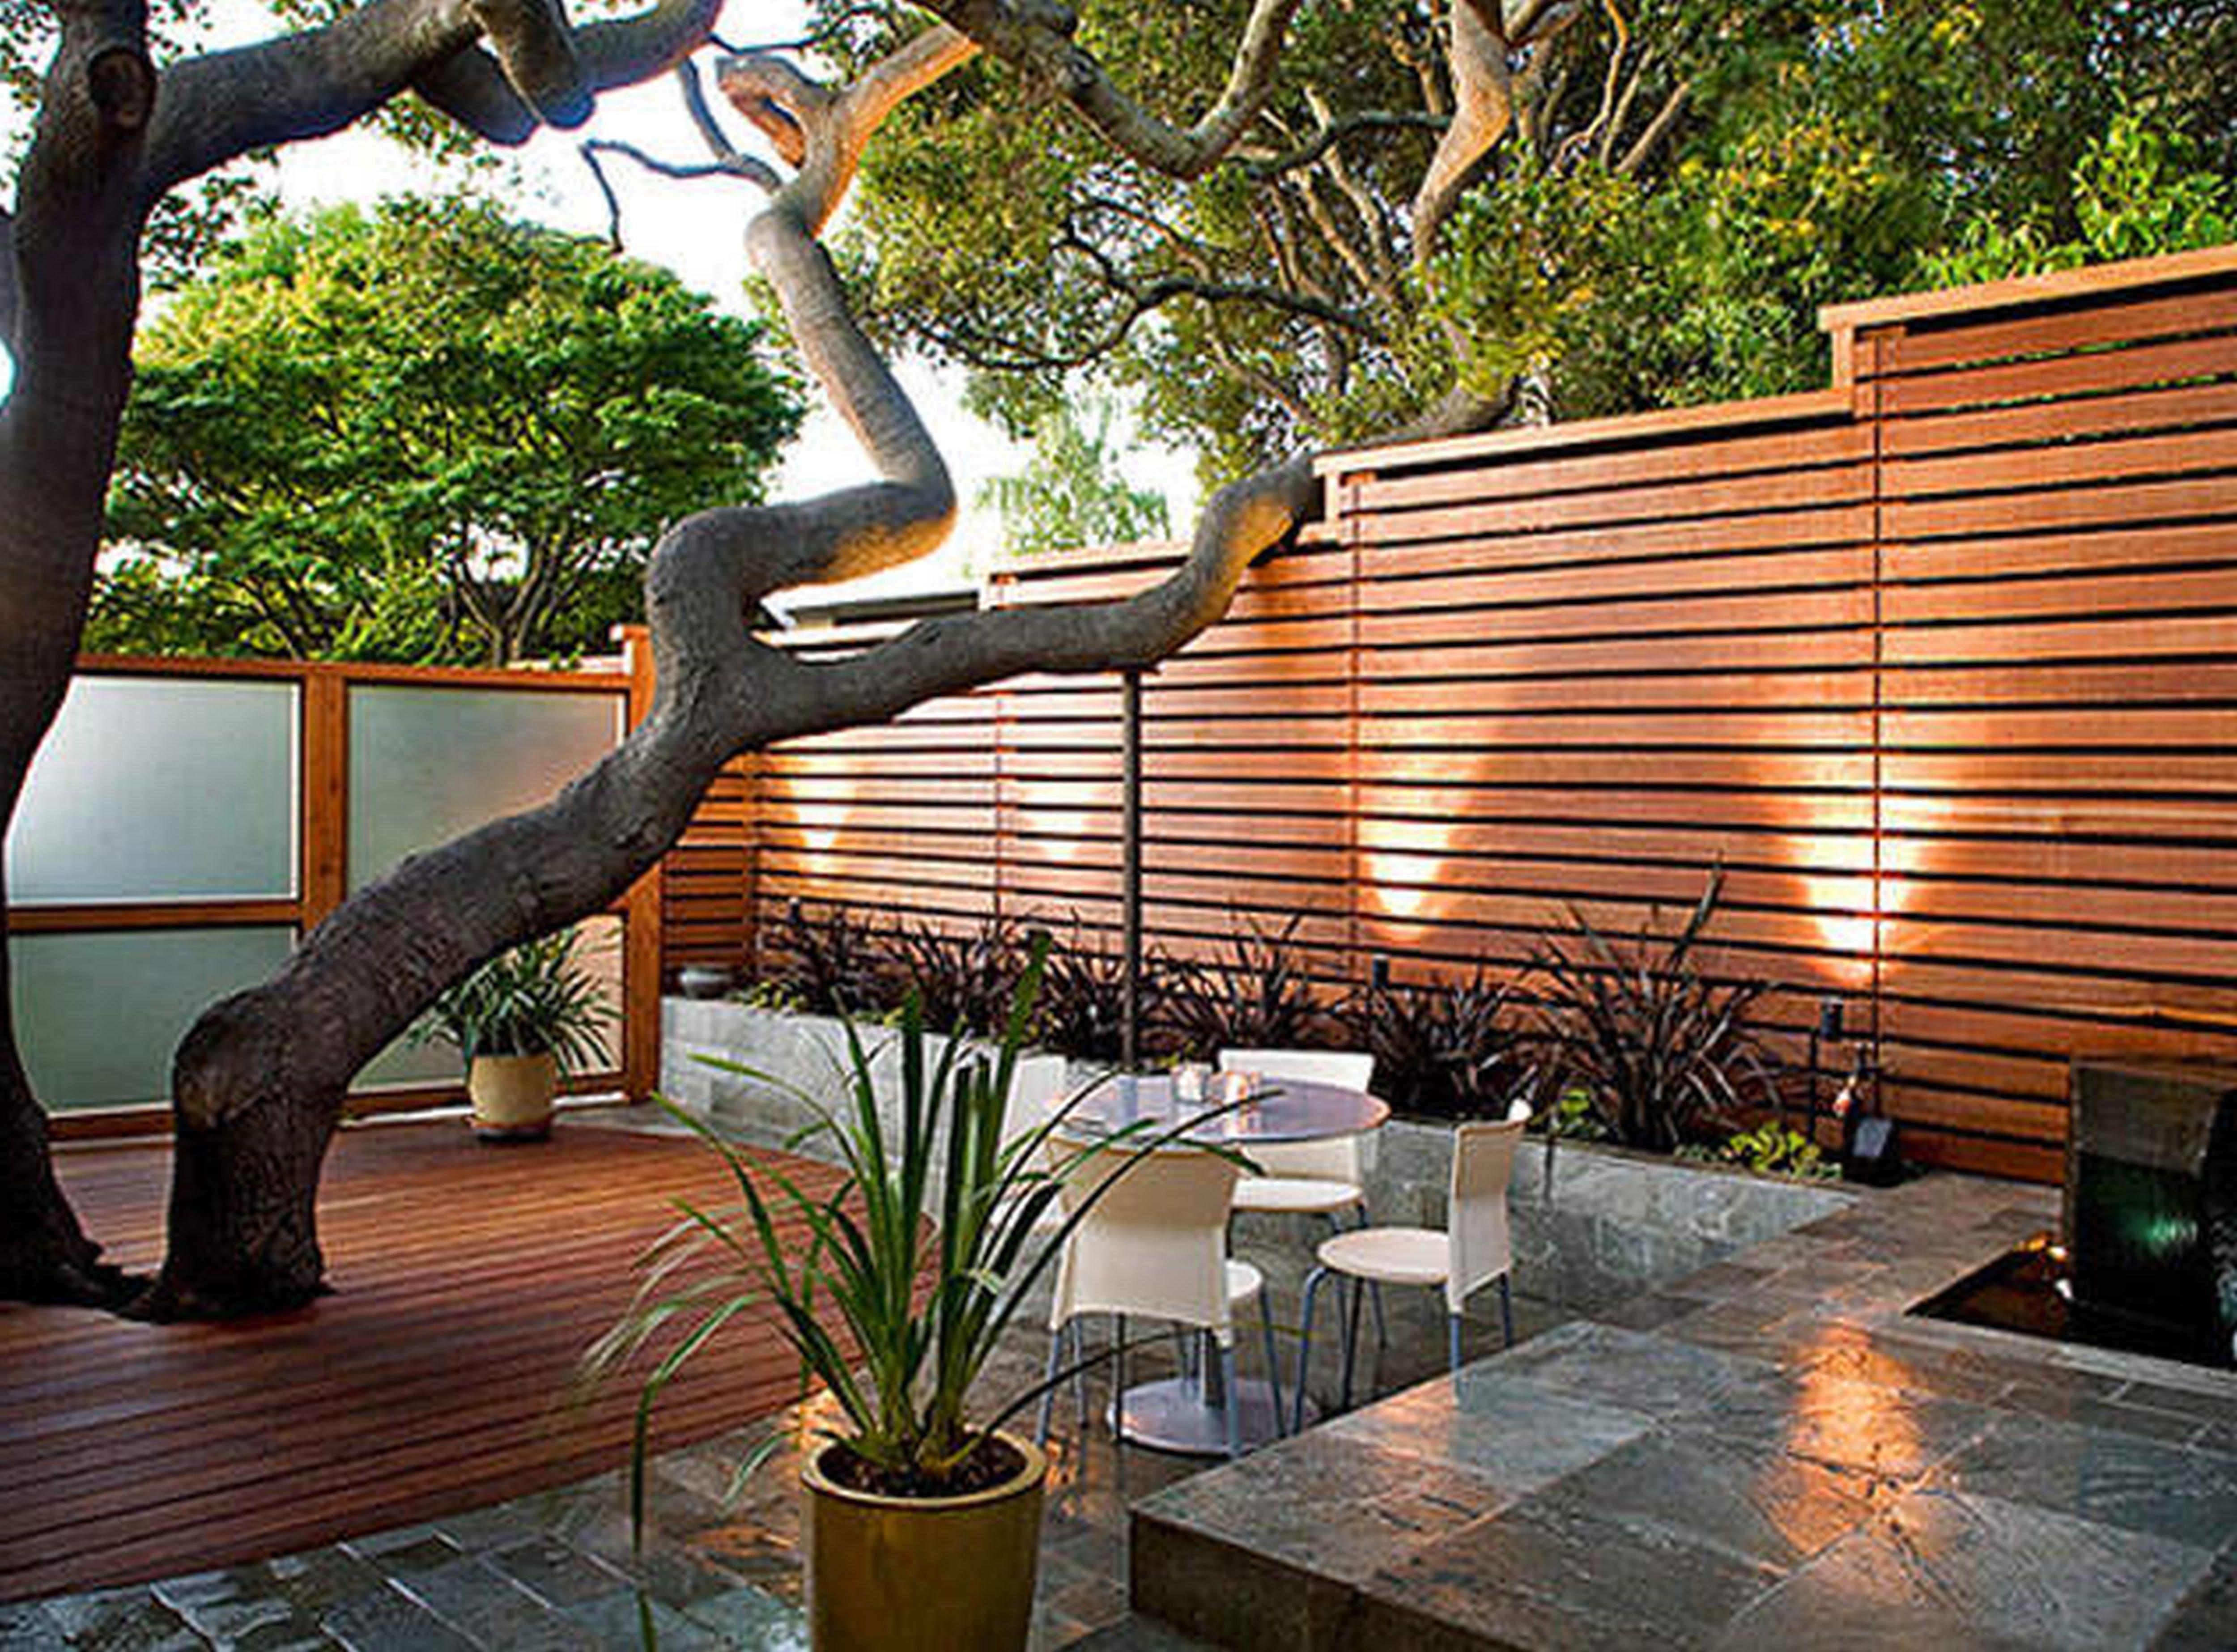 10 Nice Mid Century Modern Landscape Design Ideas mid century modern landscape design ideas geisai amazing midcentury 2021